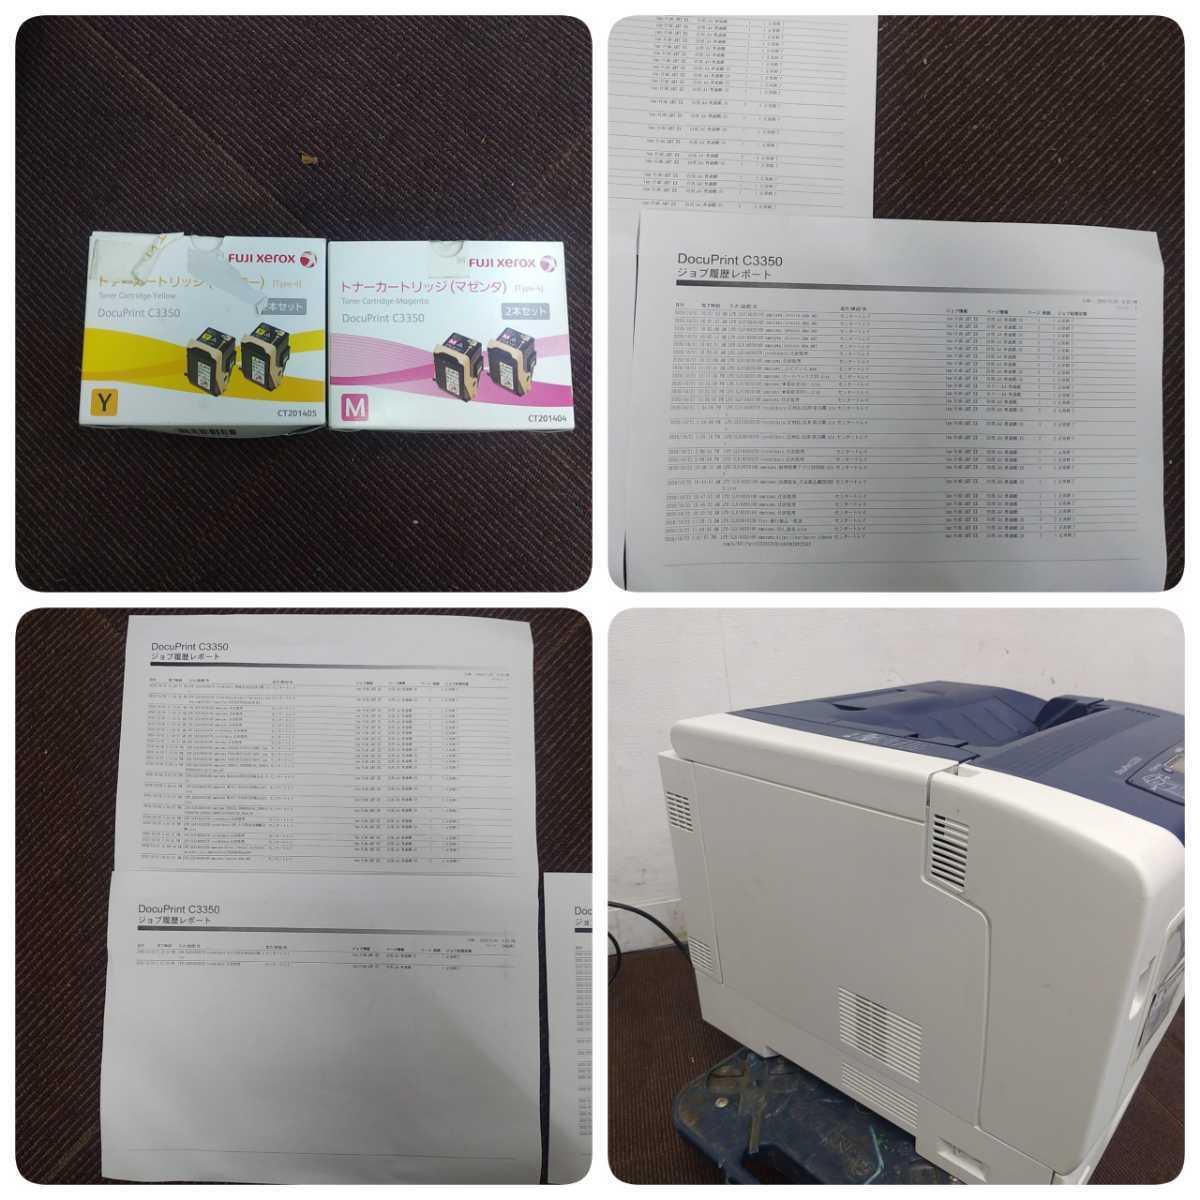 FUJI XEROX DocuPrint C3350 レーザープリンター 通電確認済み 現状品 プリンター 格安売り切りスタート☆_画像9